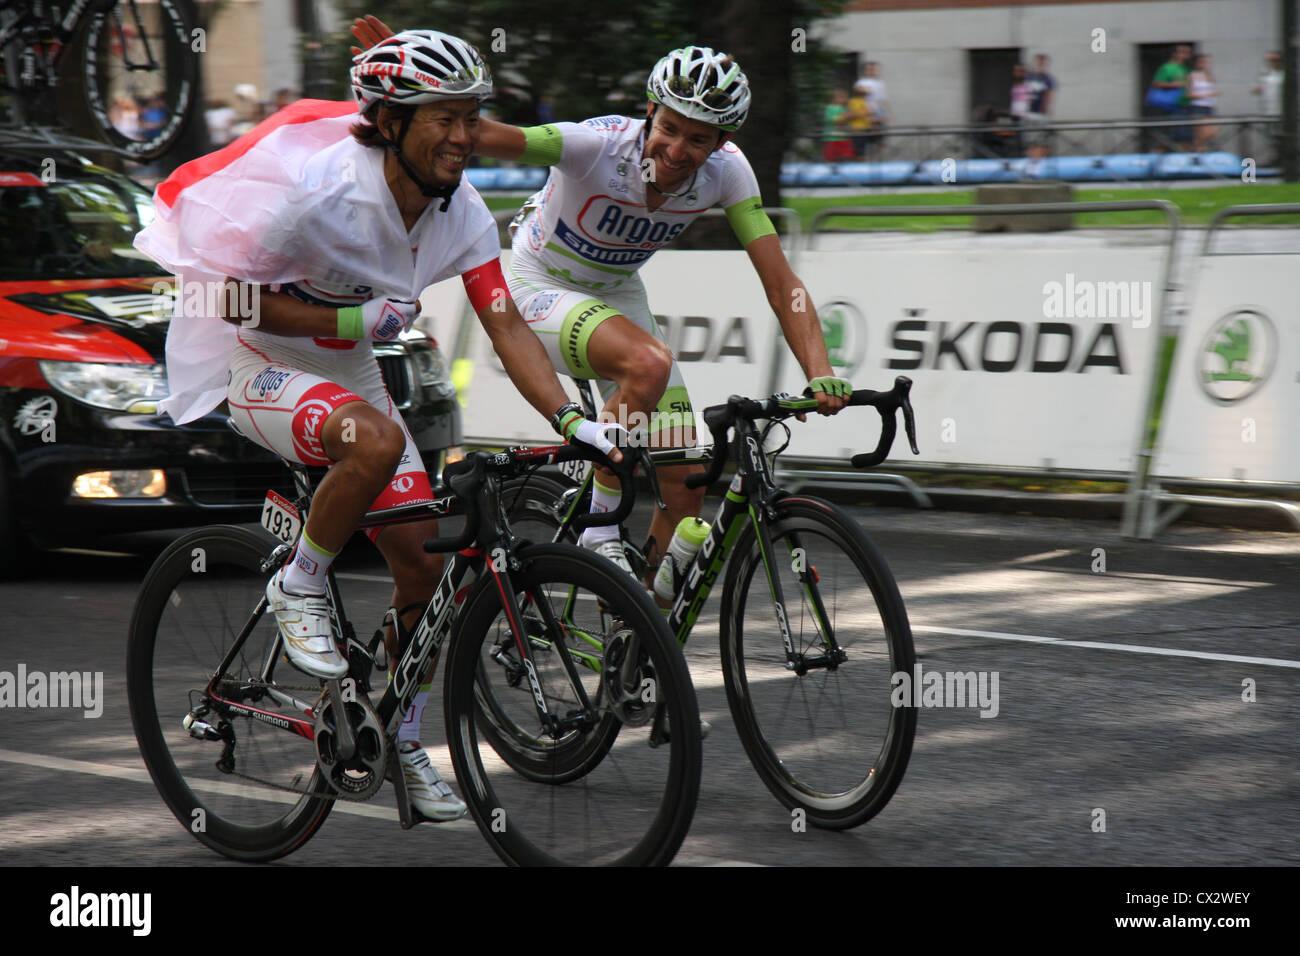 Yukihiro Doi Thierry Hupond Argos-Shimano Vuelta a España Tour of Spain 2012 9/09/2012 Paseo del Prado Madrid - Stock Image